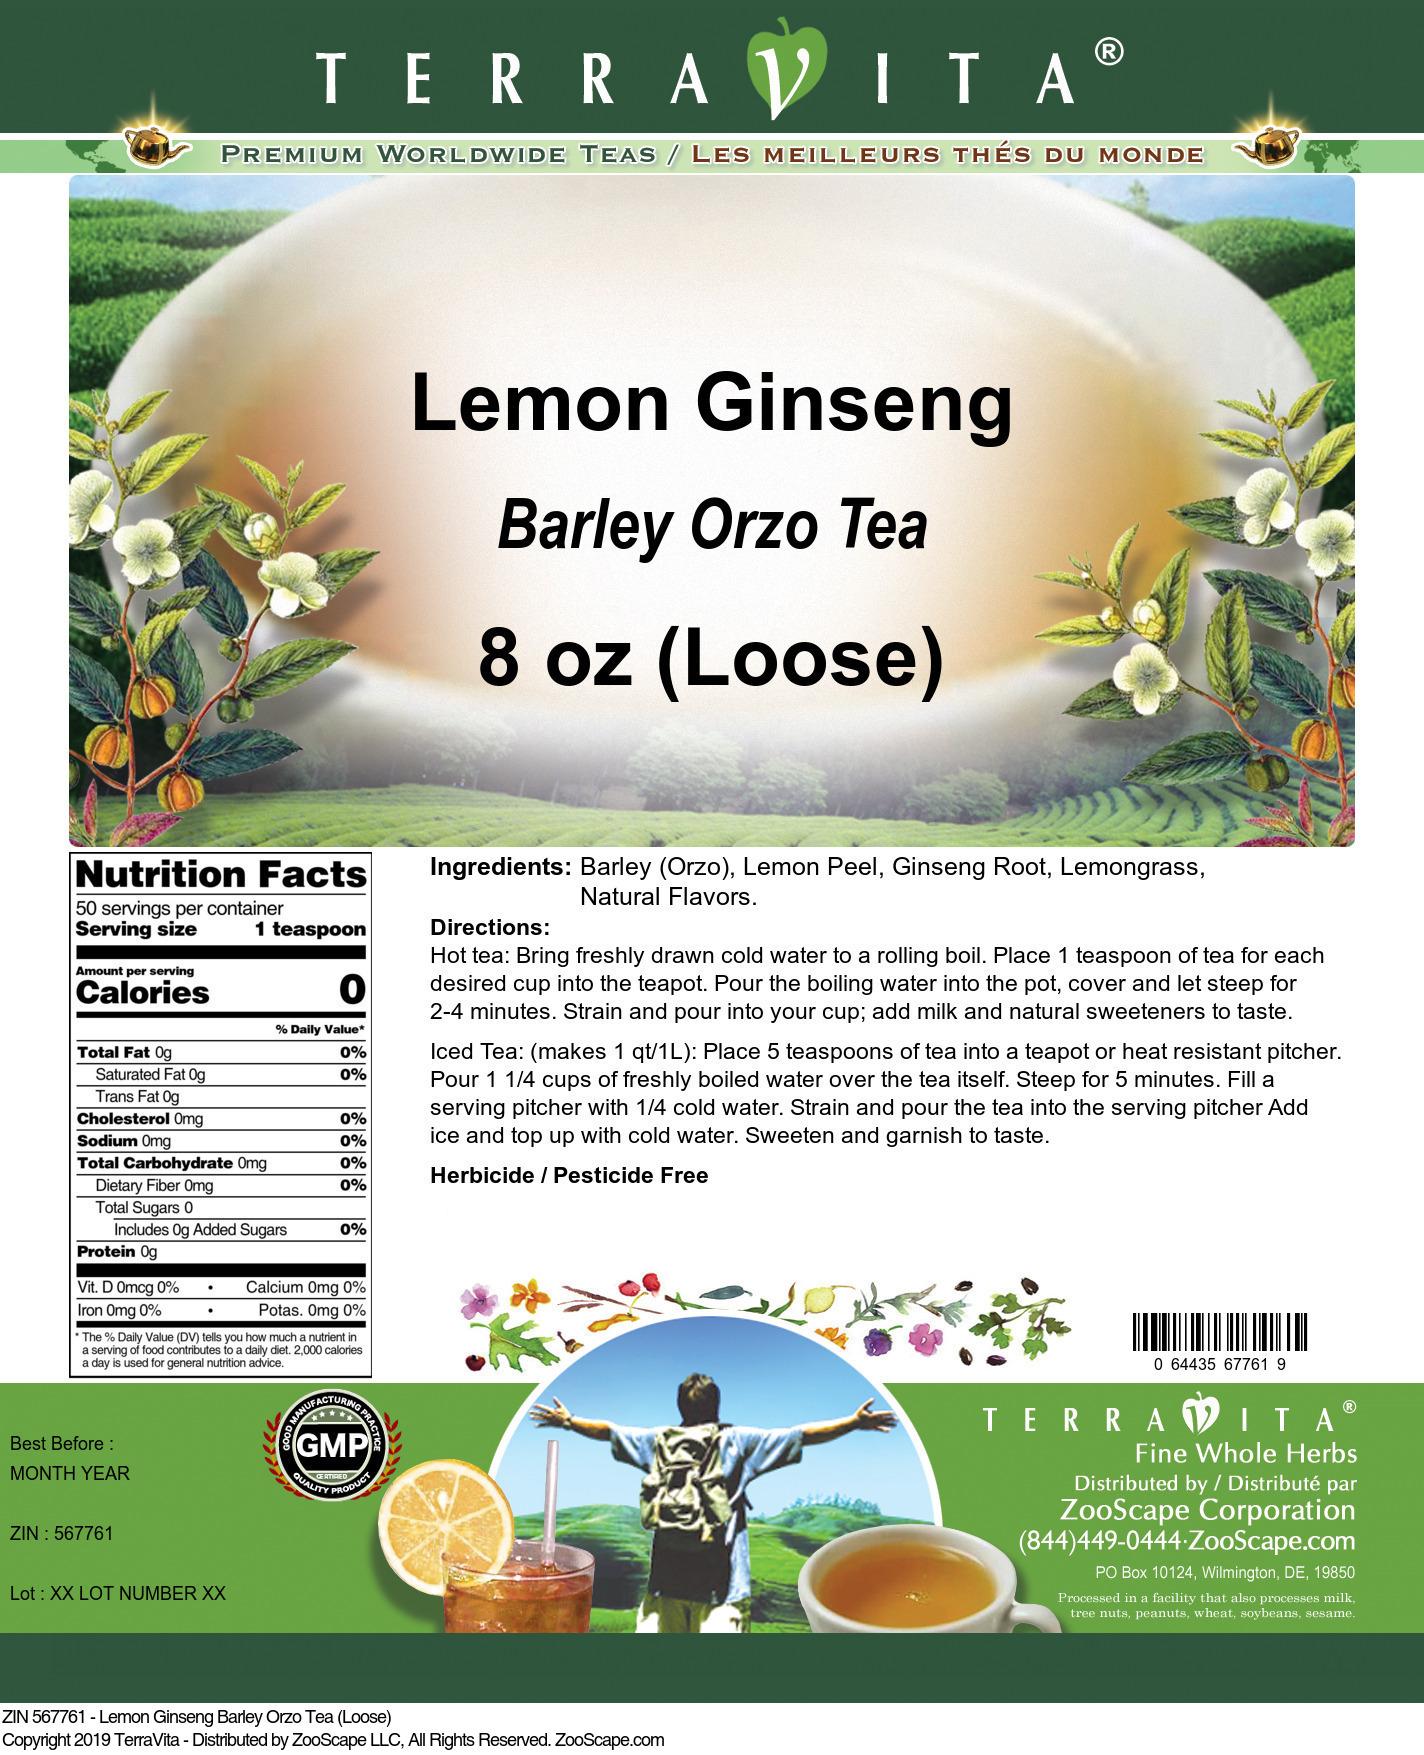 Lemon Ginseng Barley Orzo